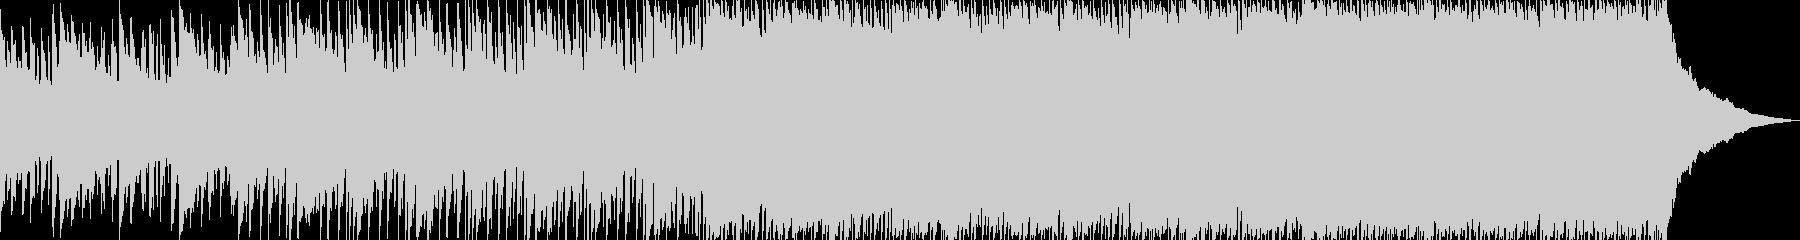 Earthboundの未再生の波形